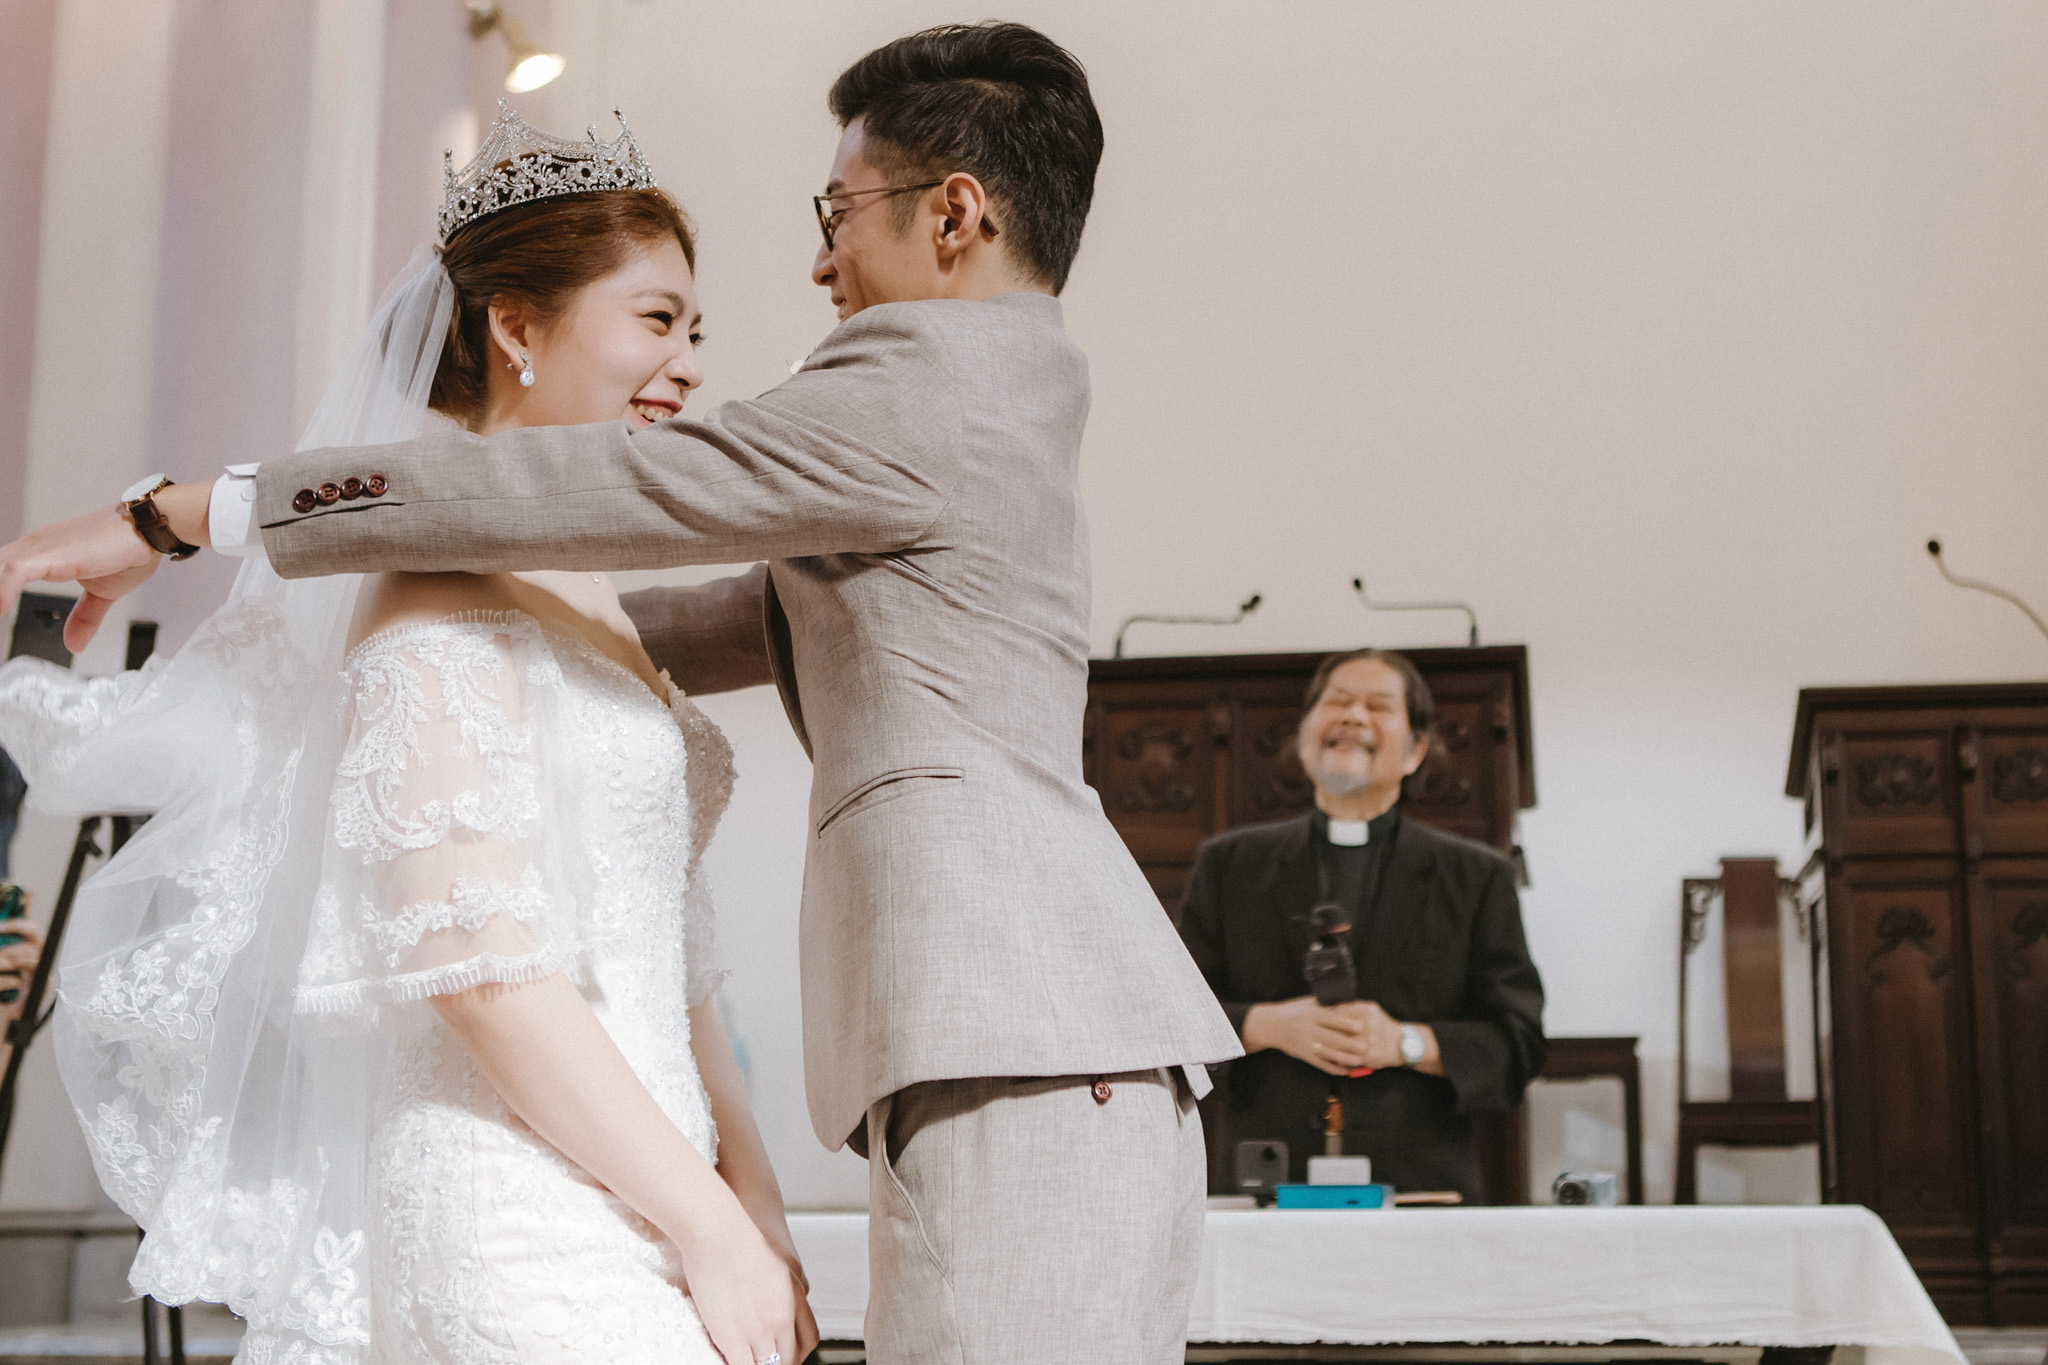 EW 台北婚攝 居米 濟南教會 Brick Yard 33 美軍俱樂部 婚禮 婚宴-33